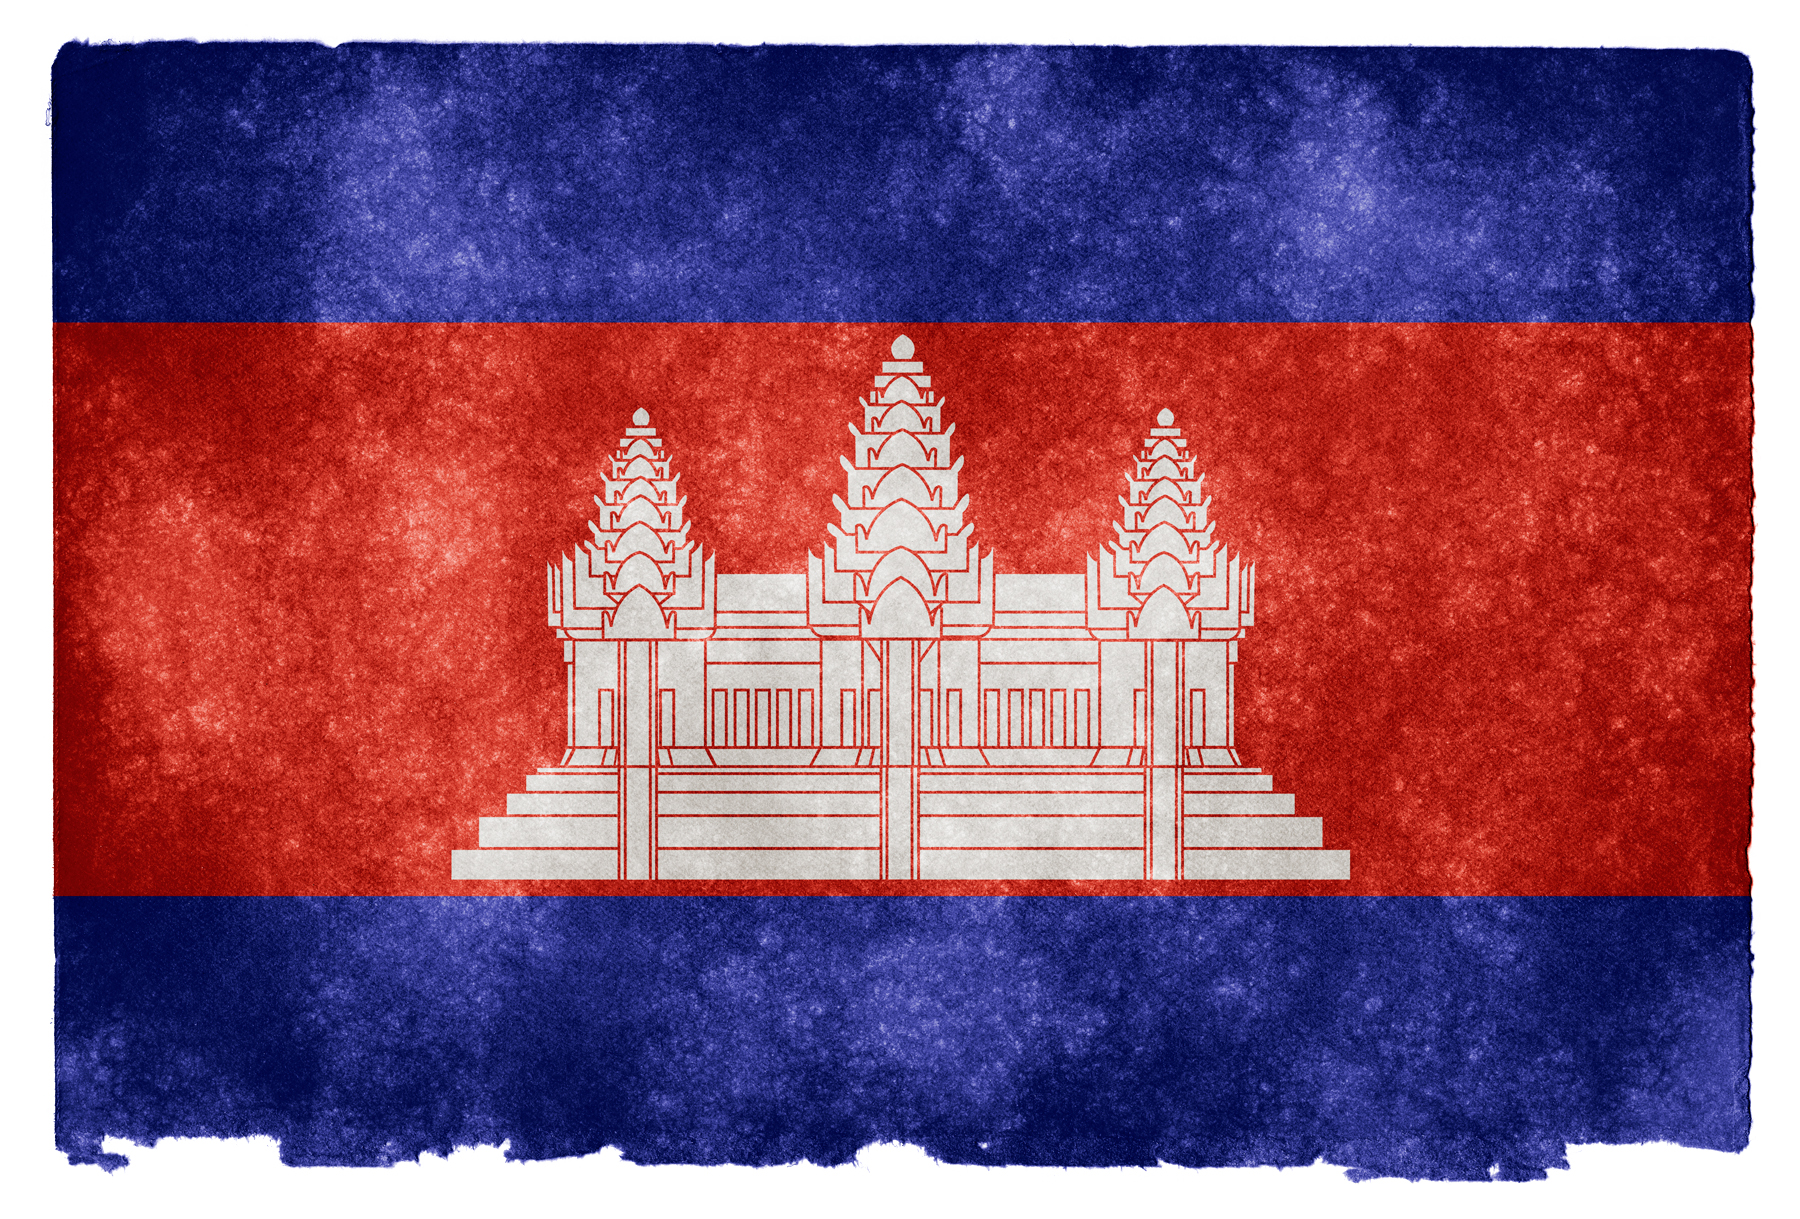 Cambodia Grunge Flag, Aged, Retro, National, Old, HQ Photo